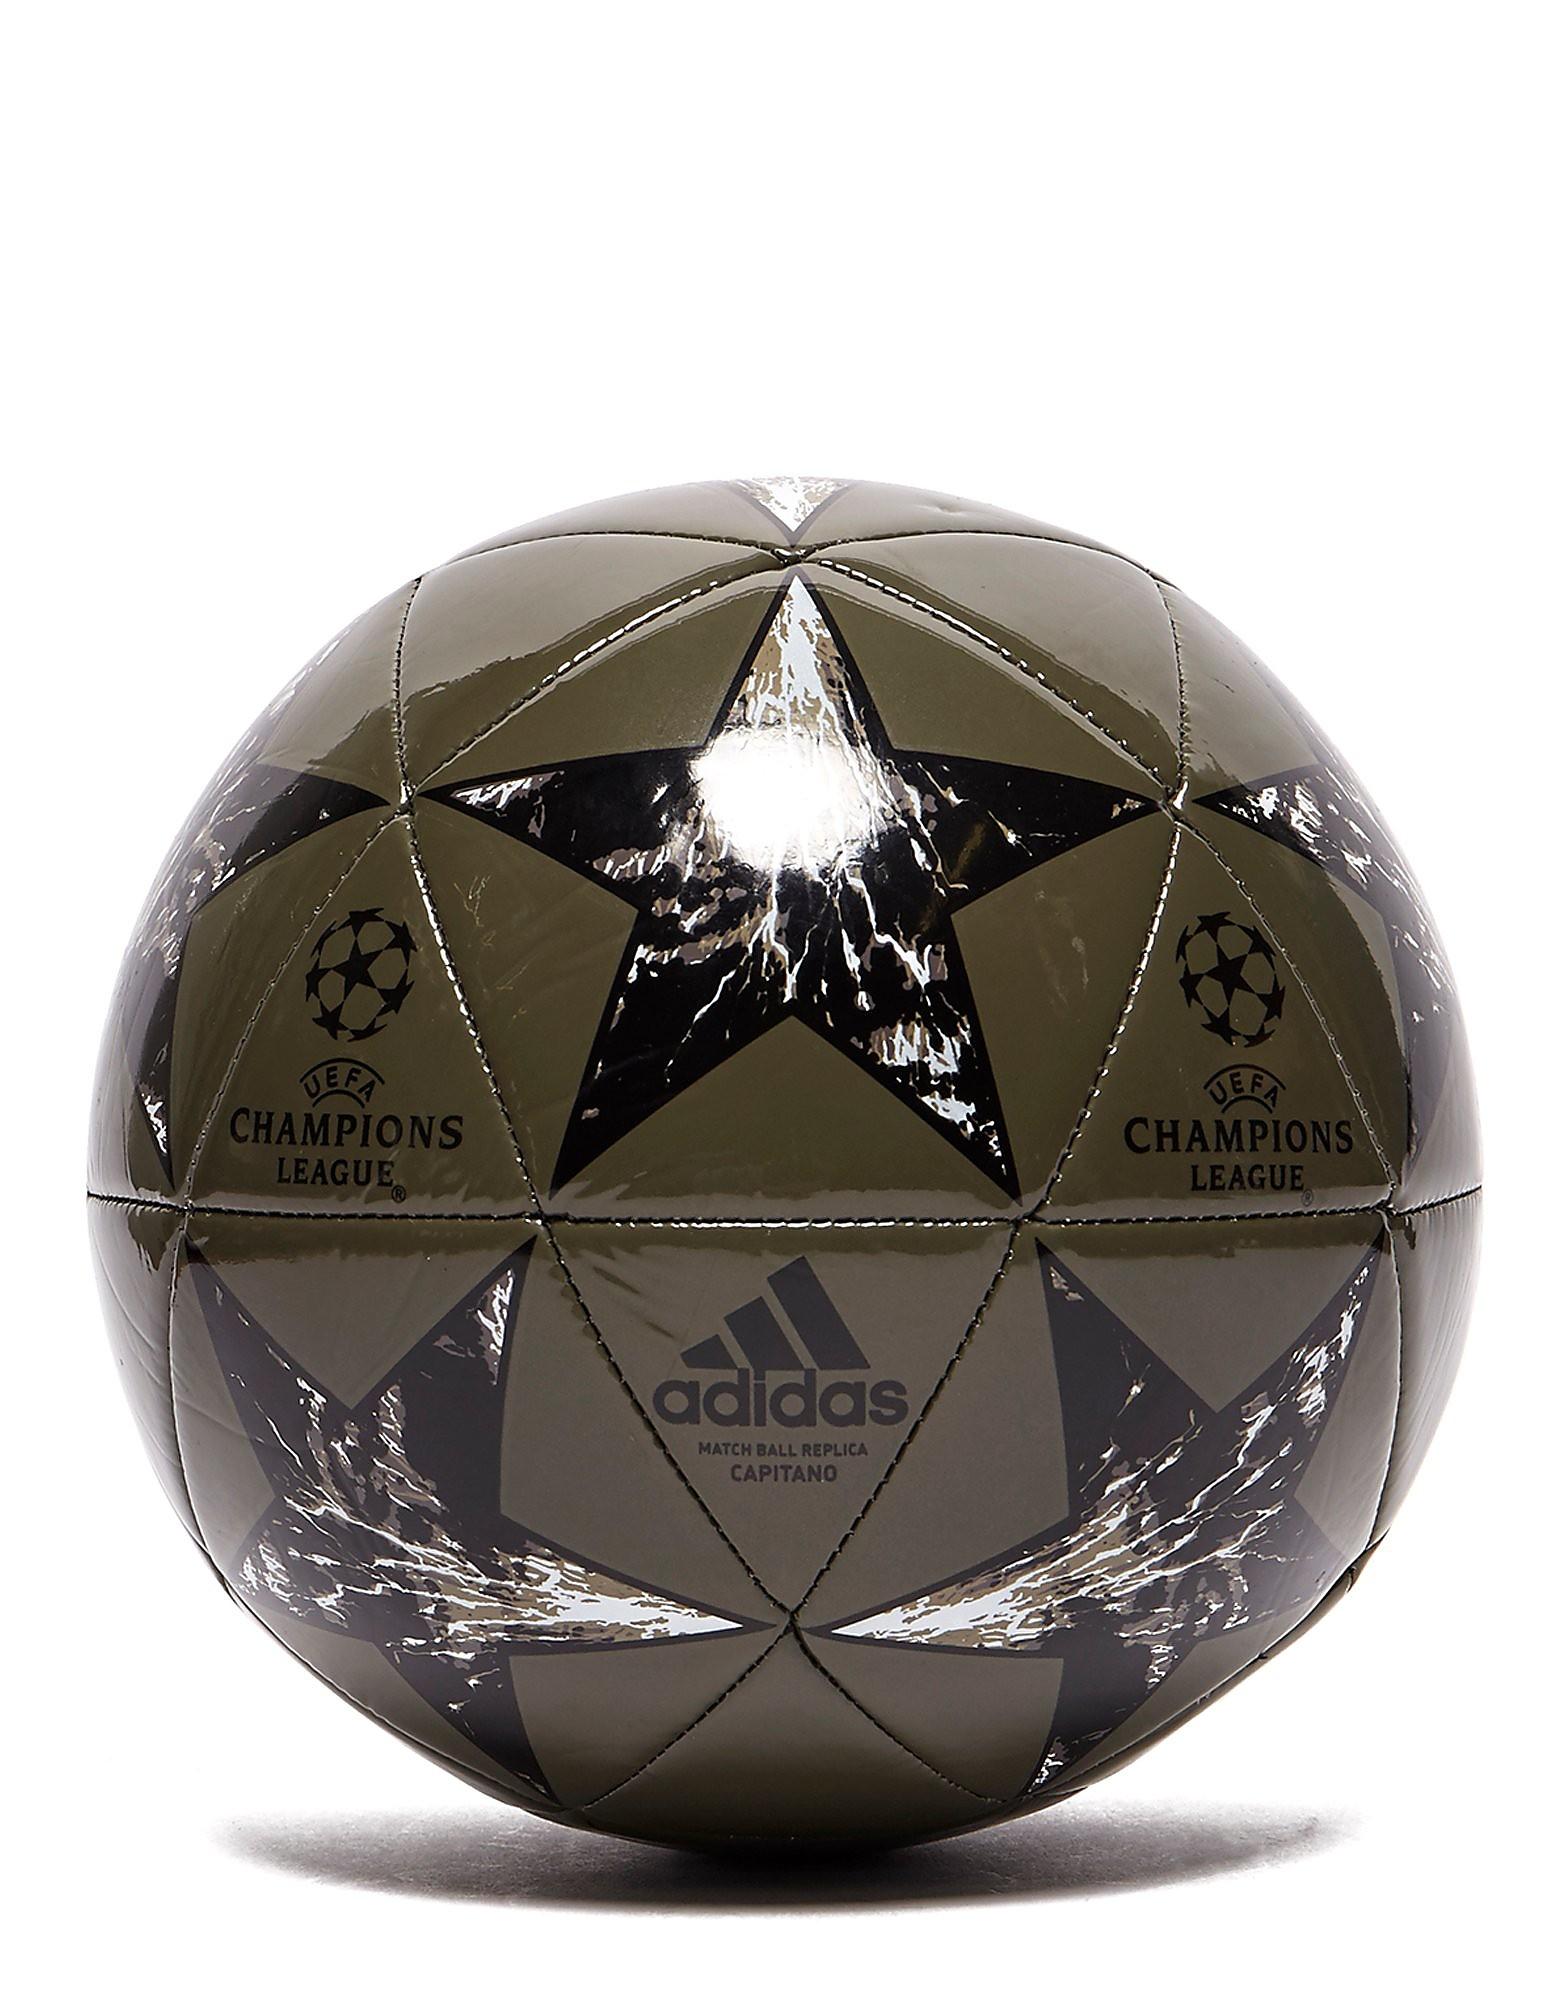 adidas Capitano Champions League Fußball